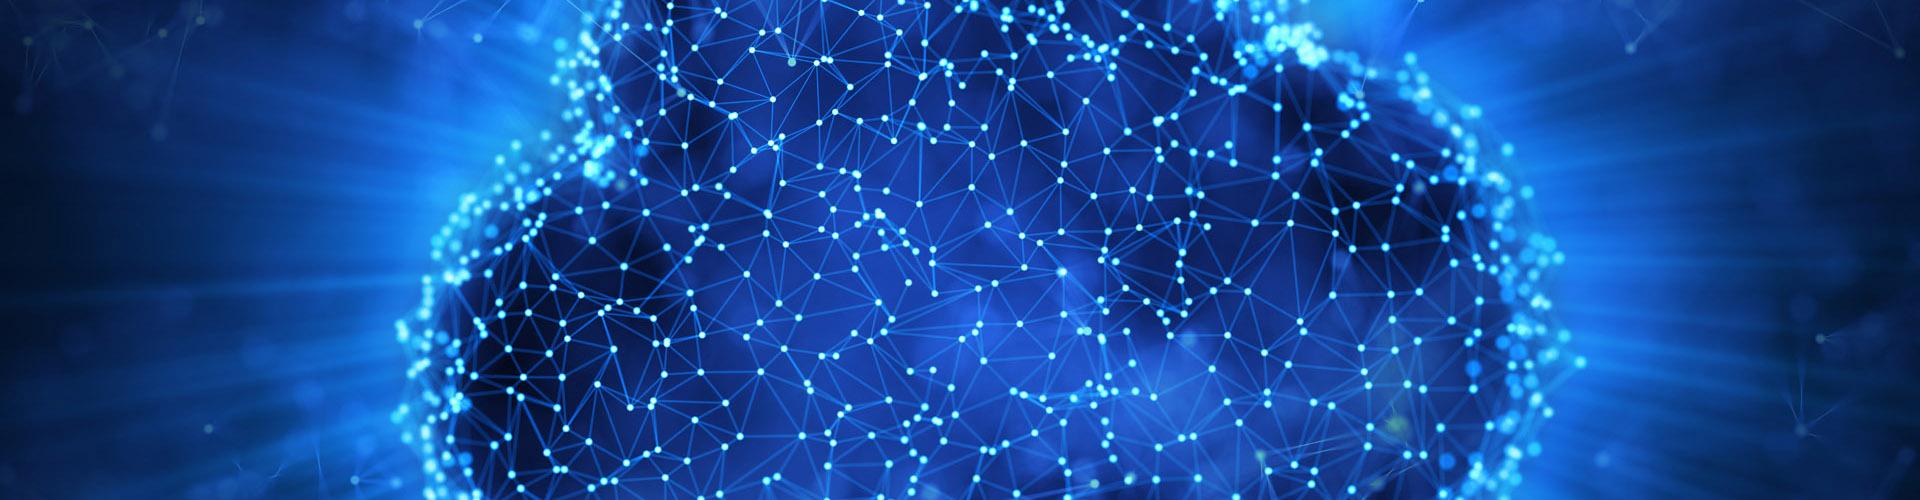 Software Personaleinsatzplanung Cloud Service – ORTEC